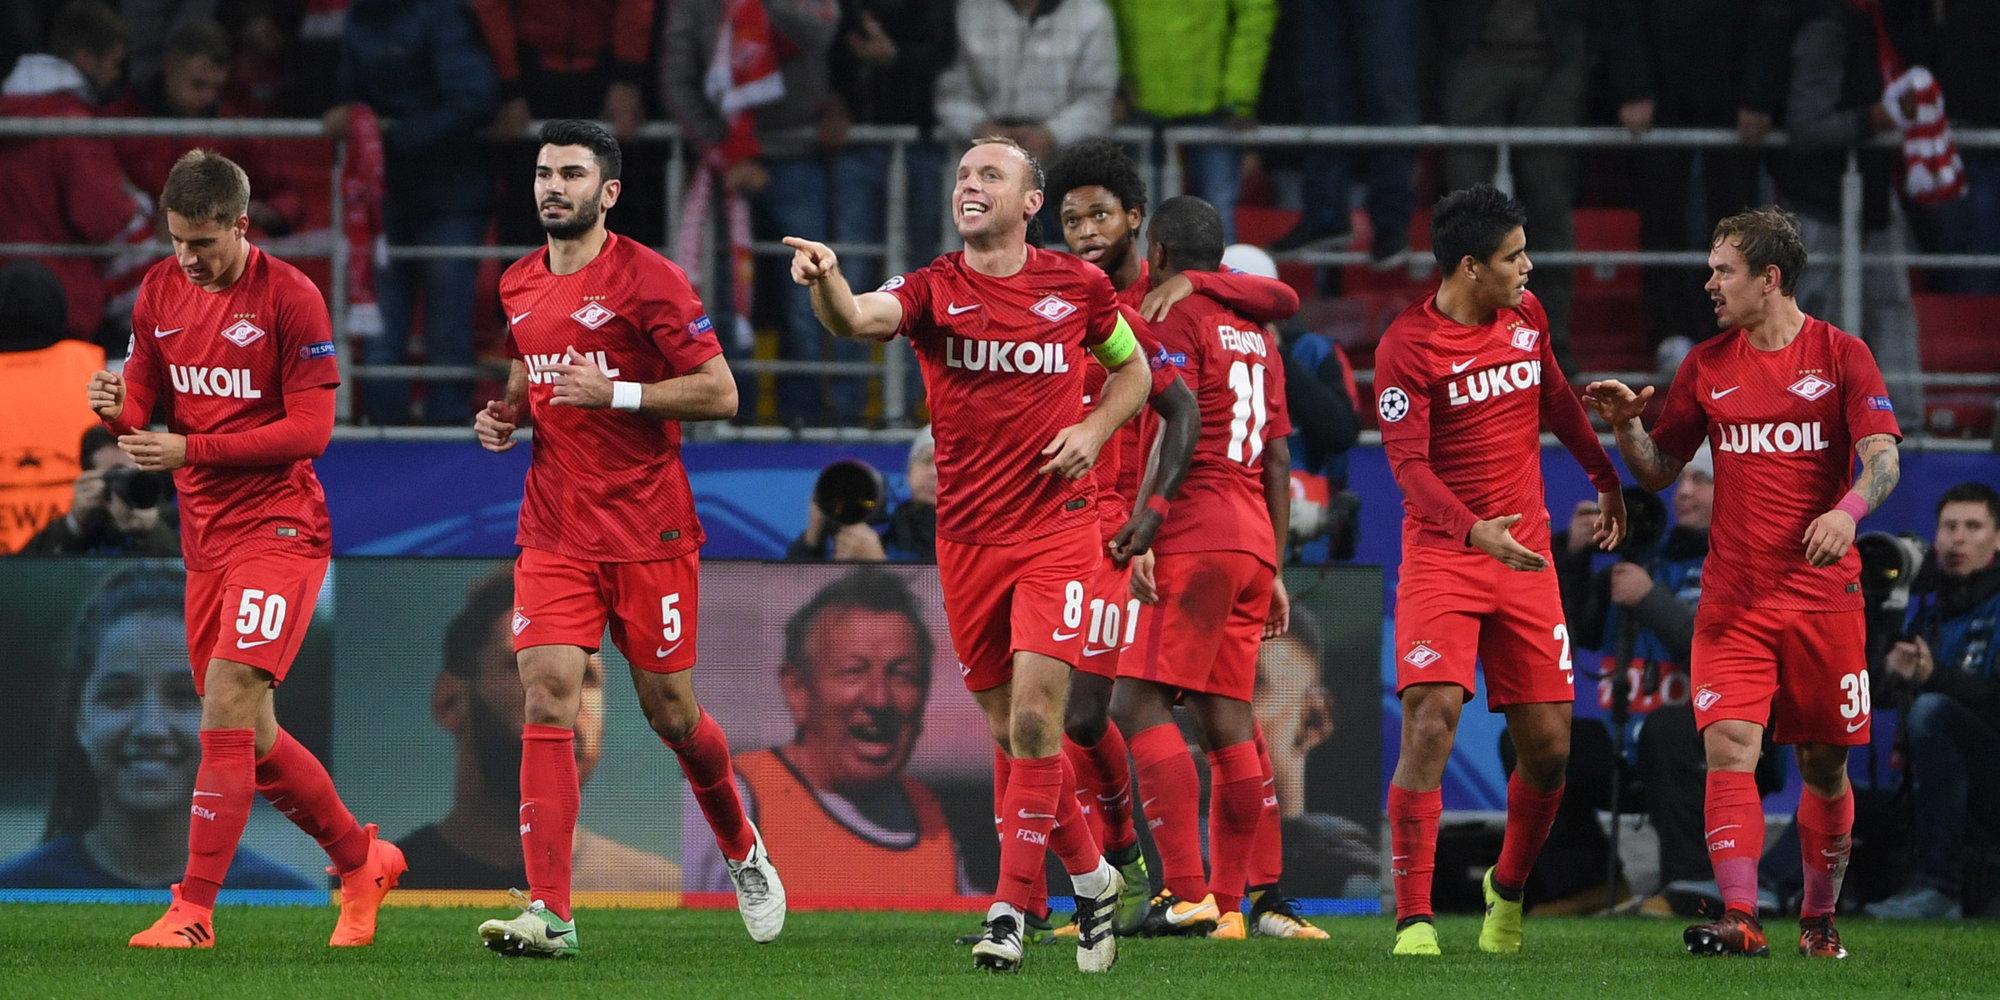 Трансляция футбола по телевизору ювентус- бавария